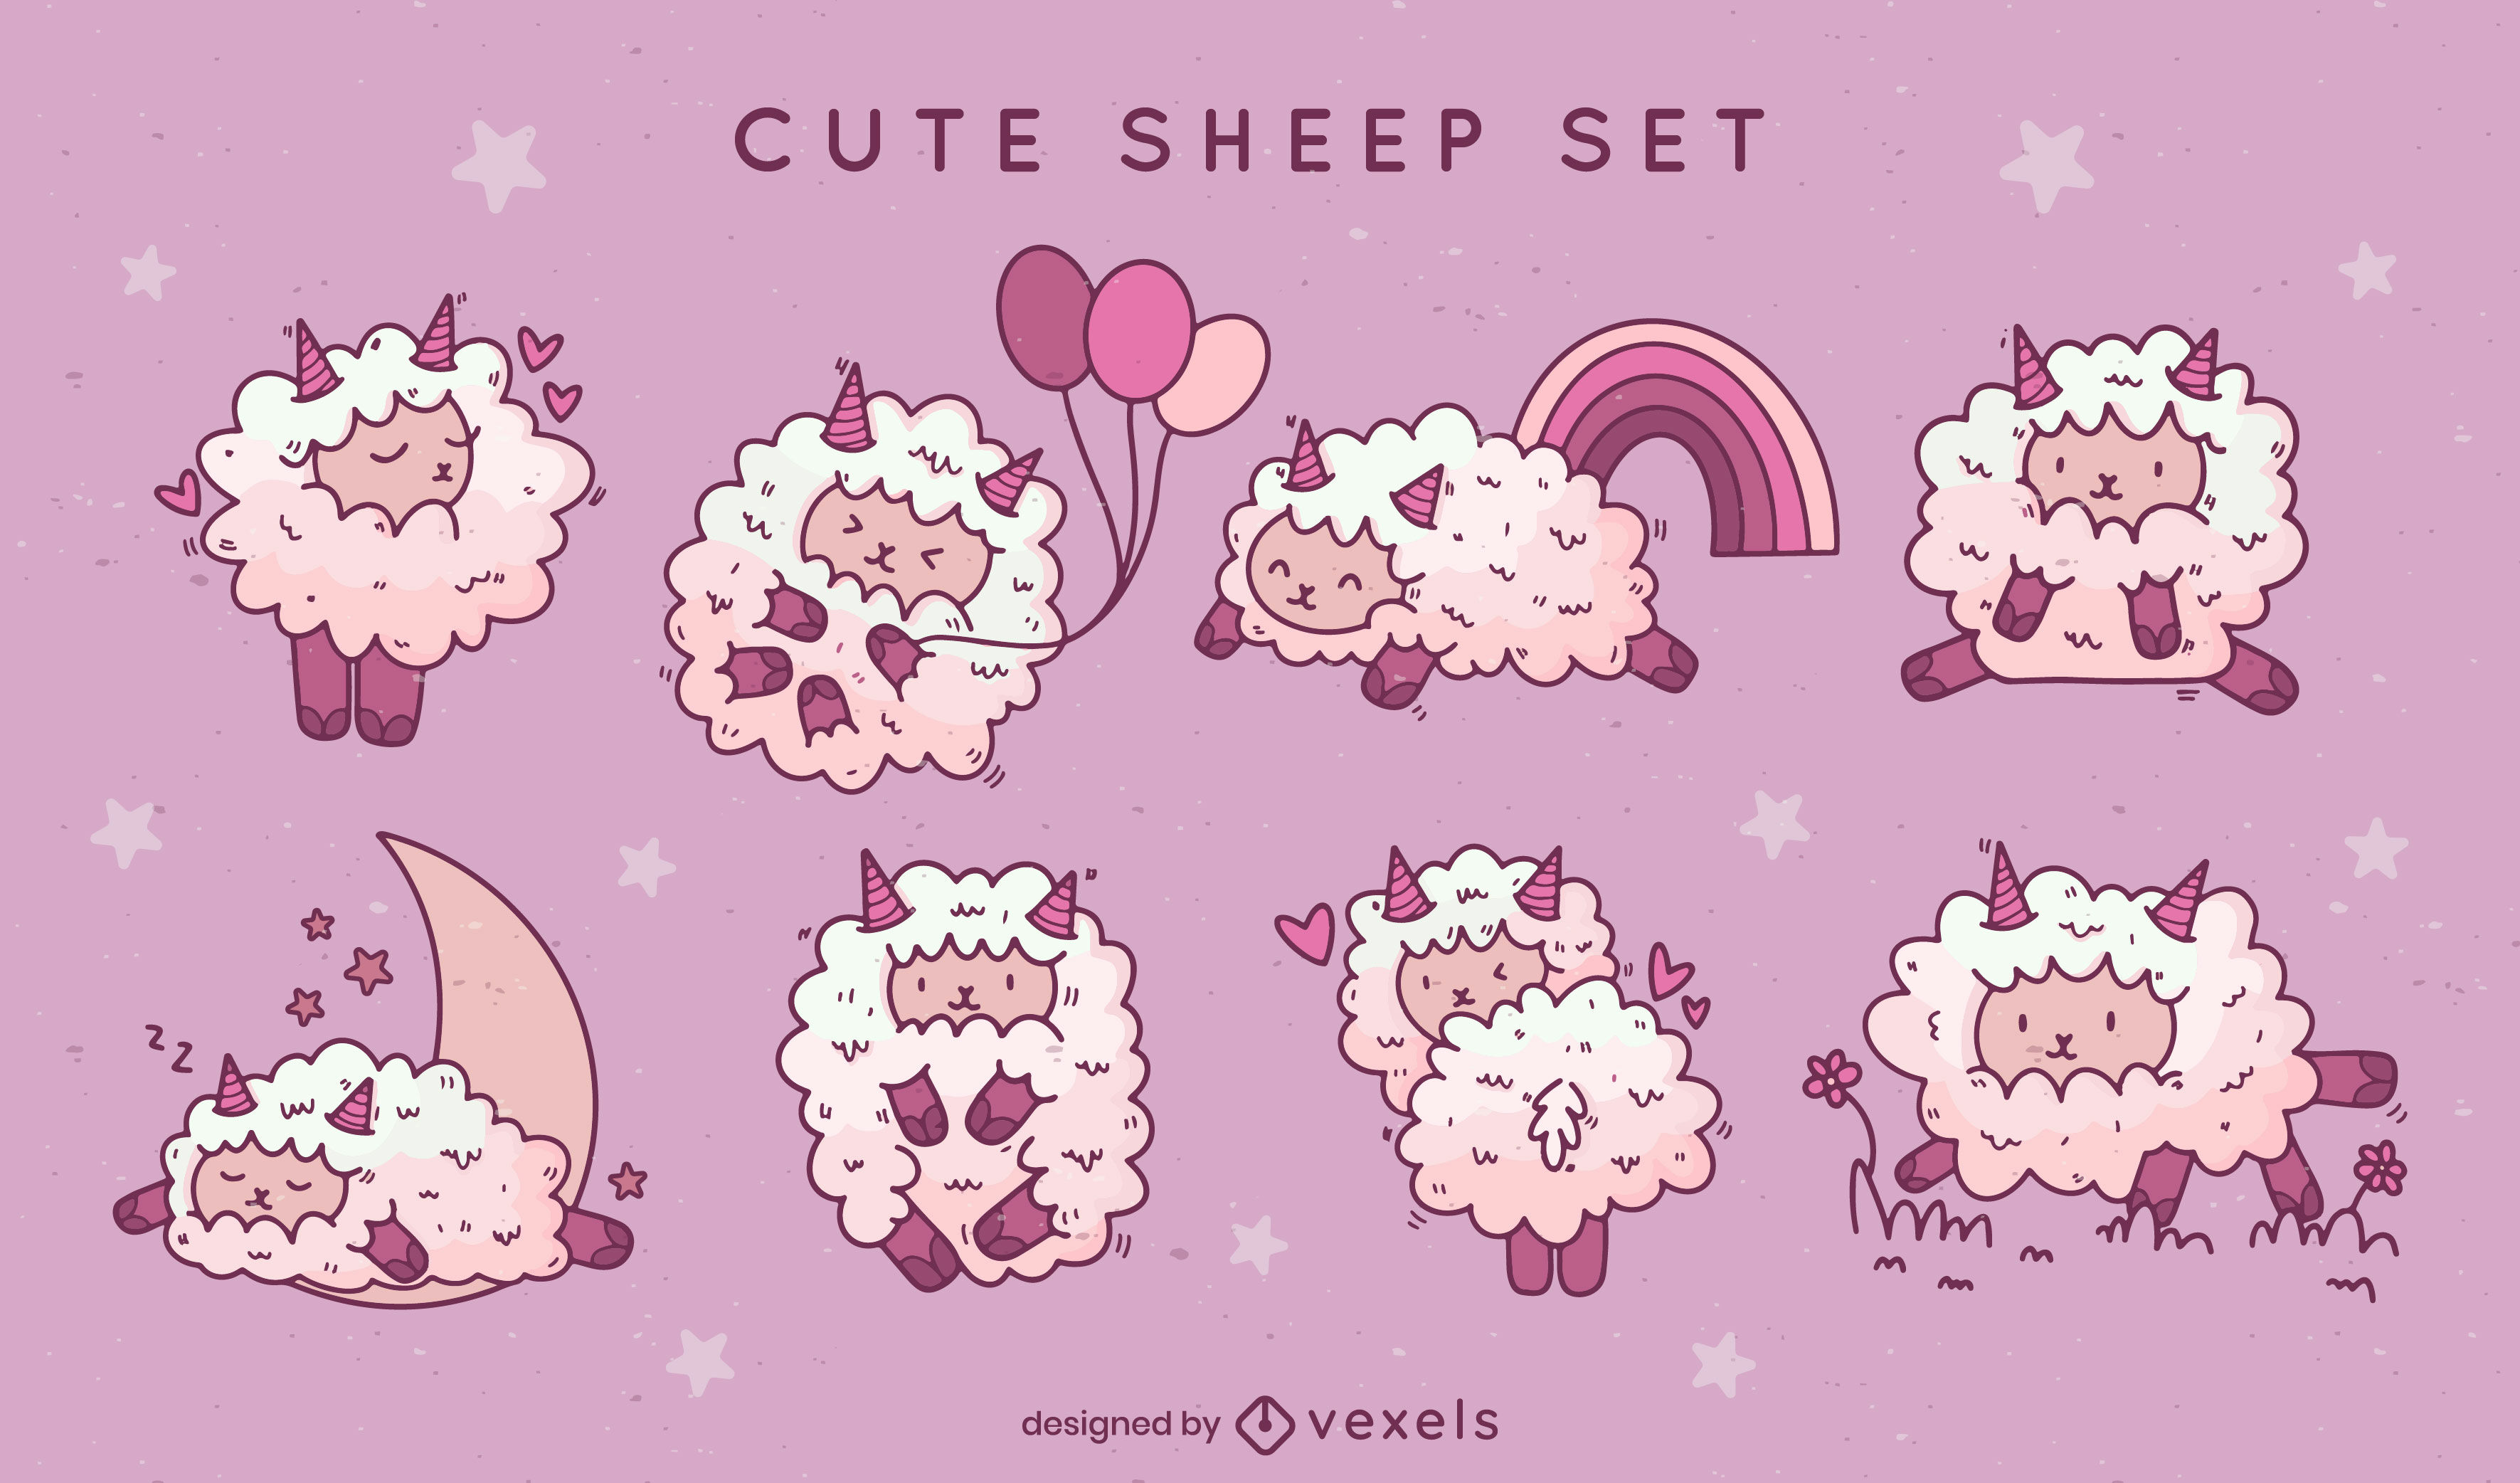 Cute sheep farm animals character set